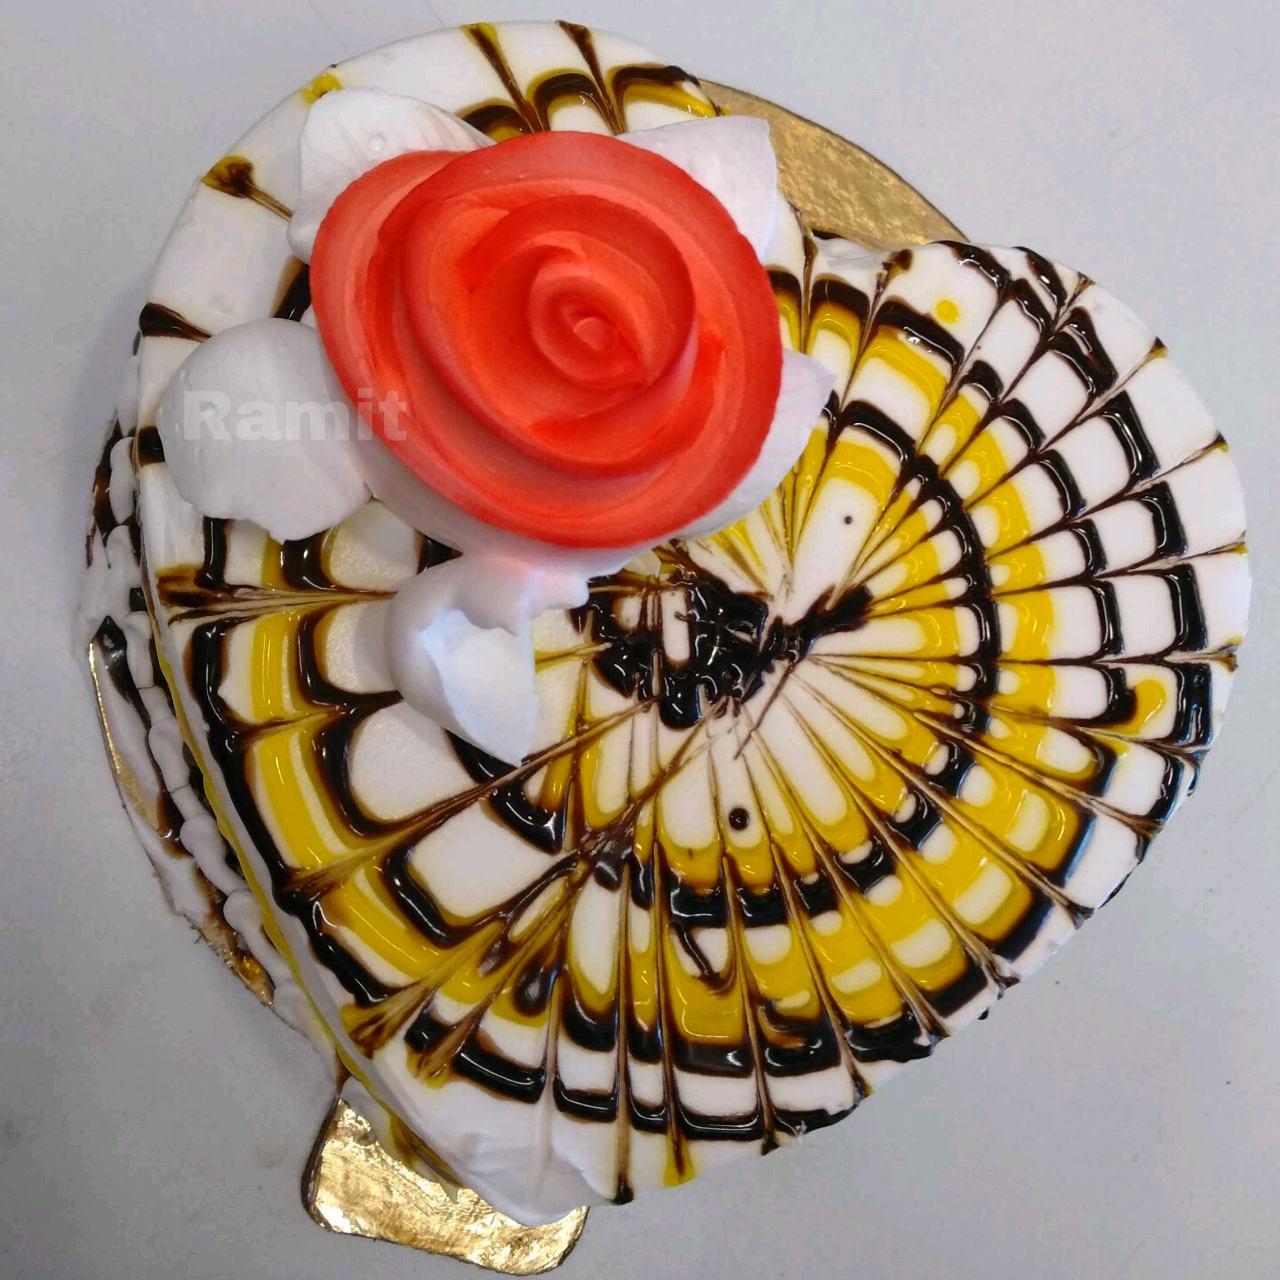 Caramel Cake Topped With Chocolate,Pineapple Glaze